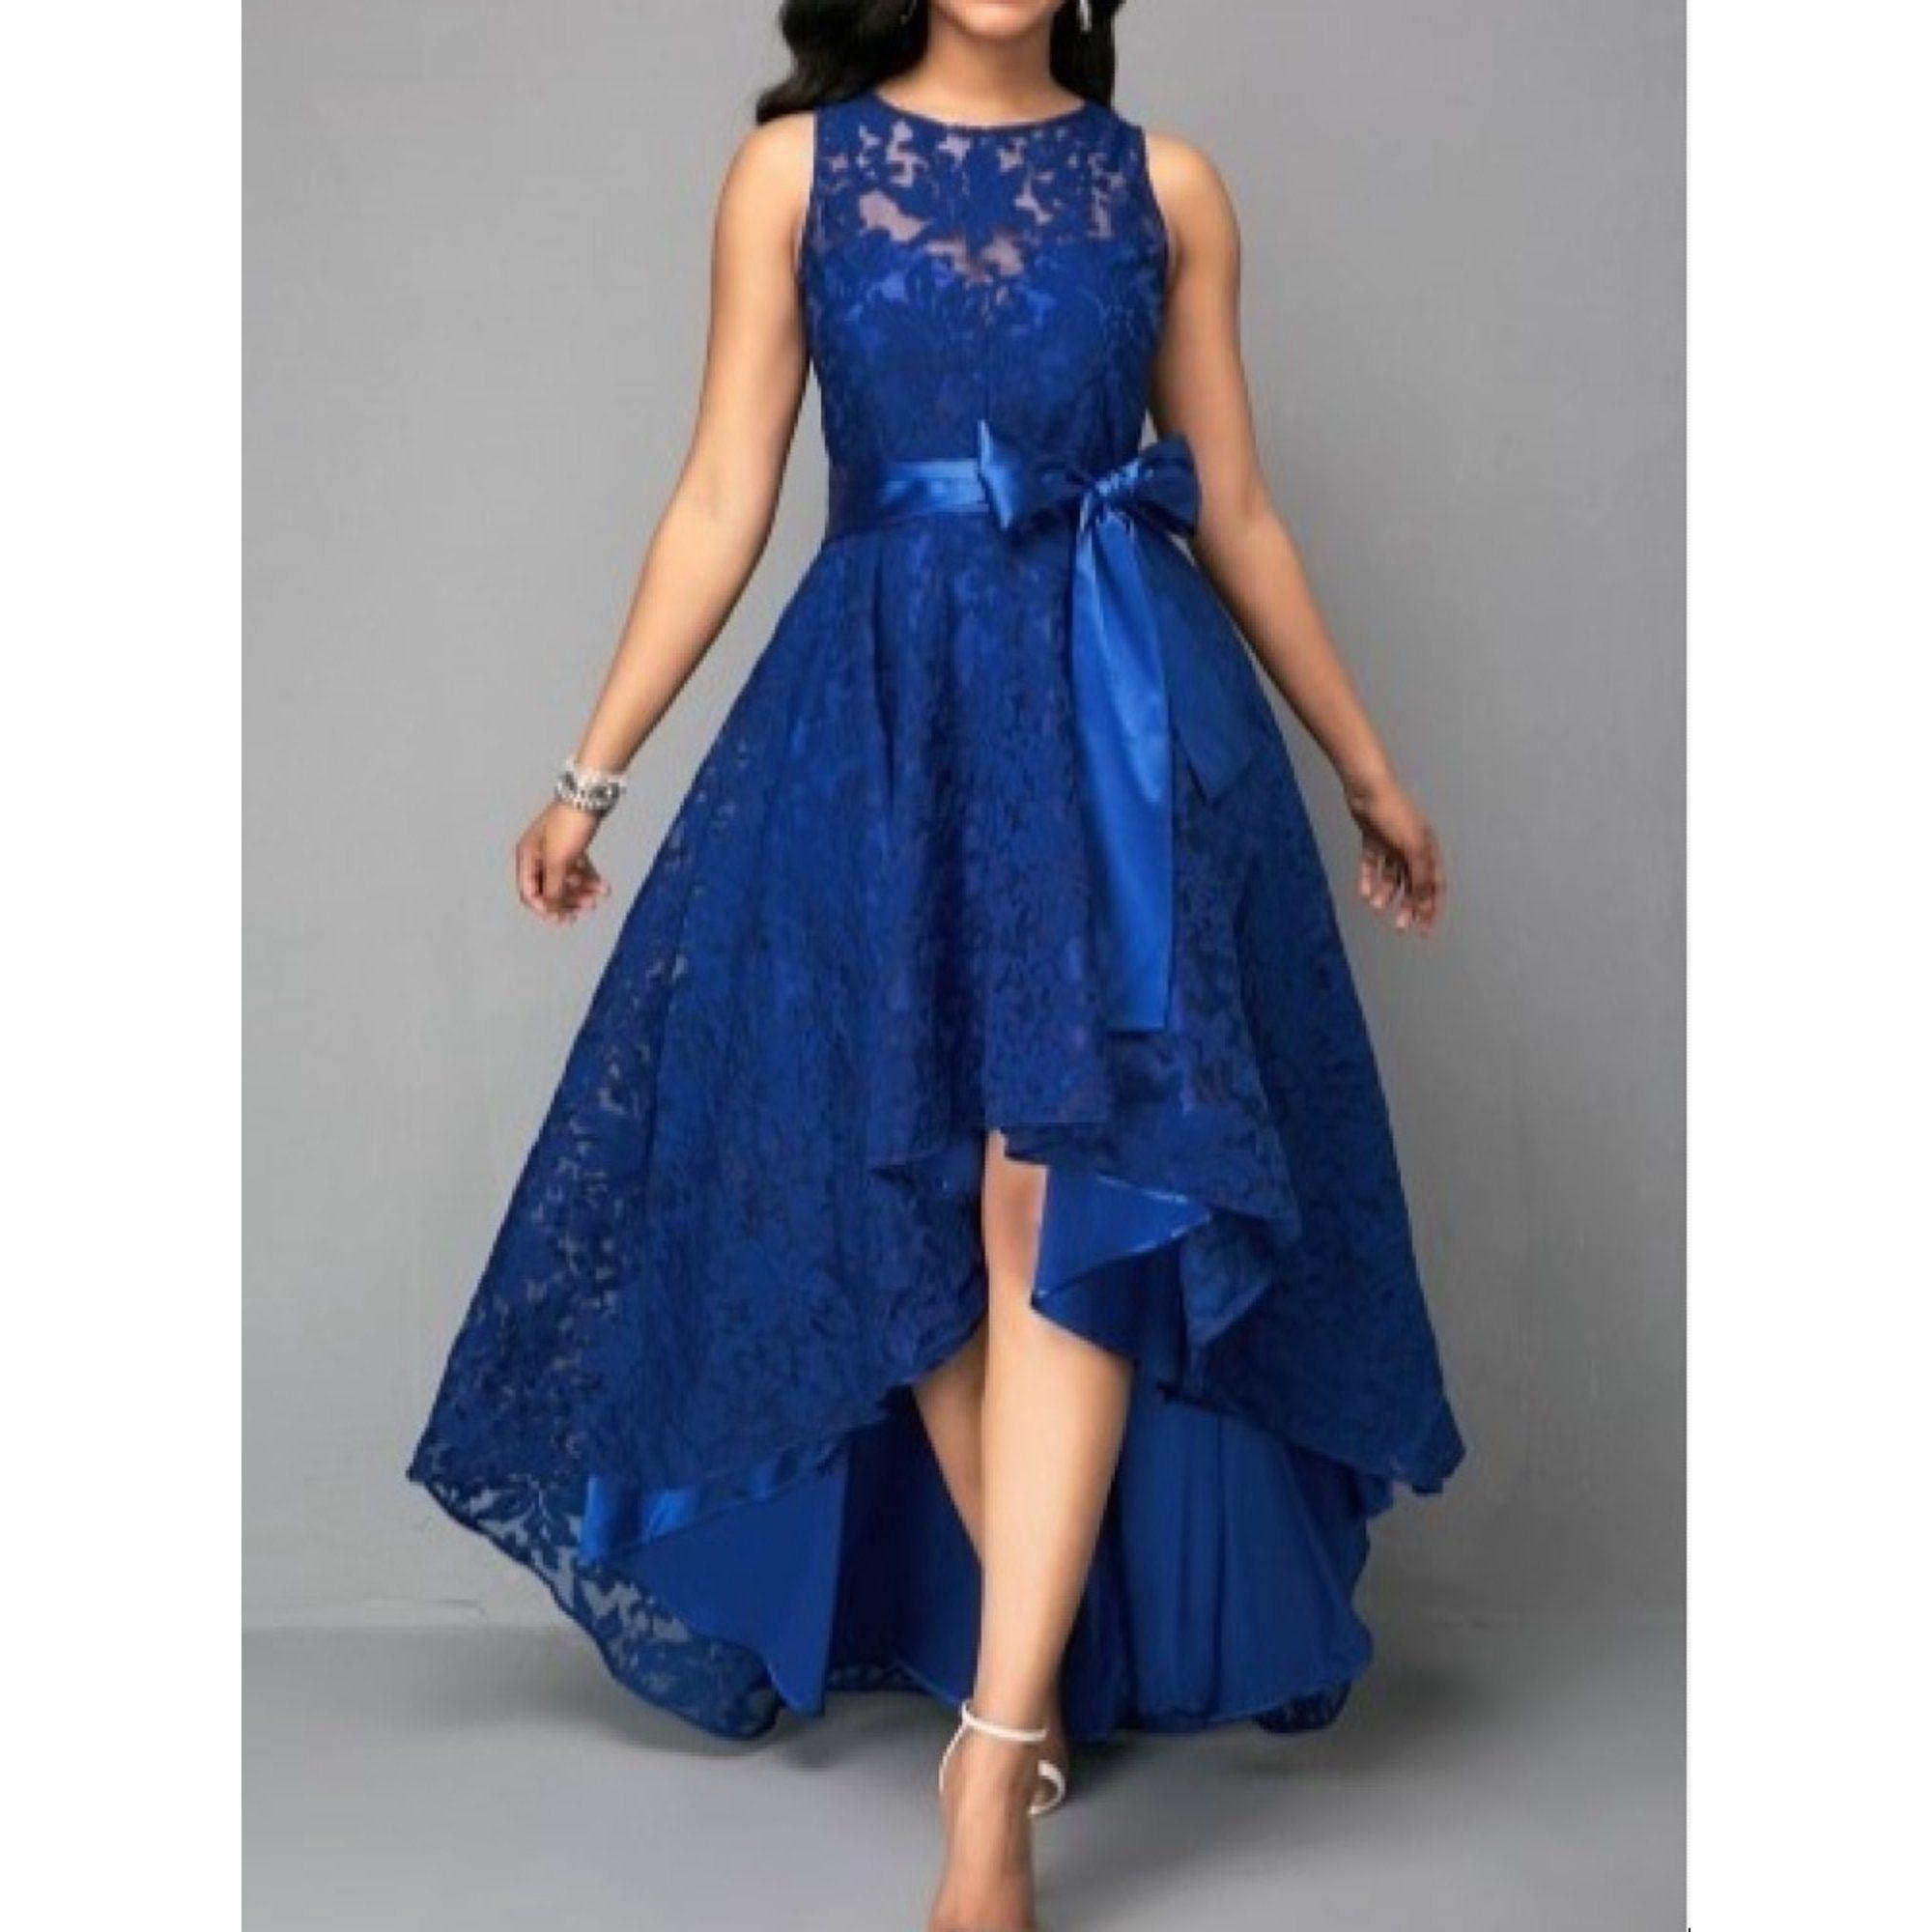 Sysea Sleeveless Women Lace Party Dress Irregular Dresses Walmart Com In 2021 Lace Party Dresses Lace Blue Dress High Low Prom Dresses [ 2000 x 2000 Pixel ]